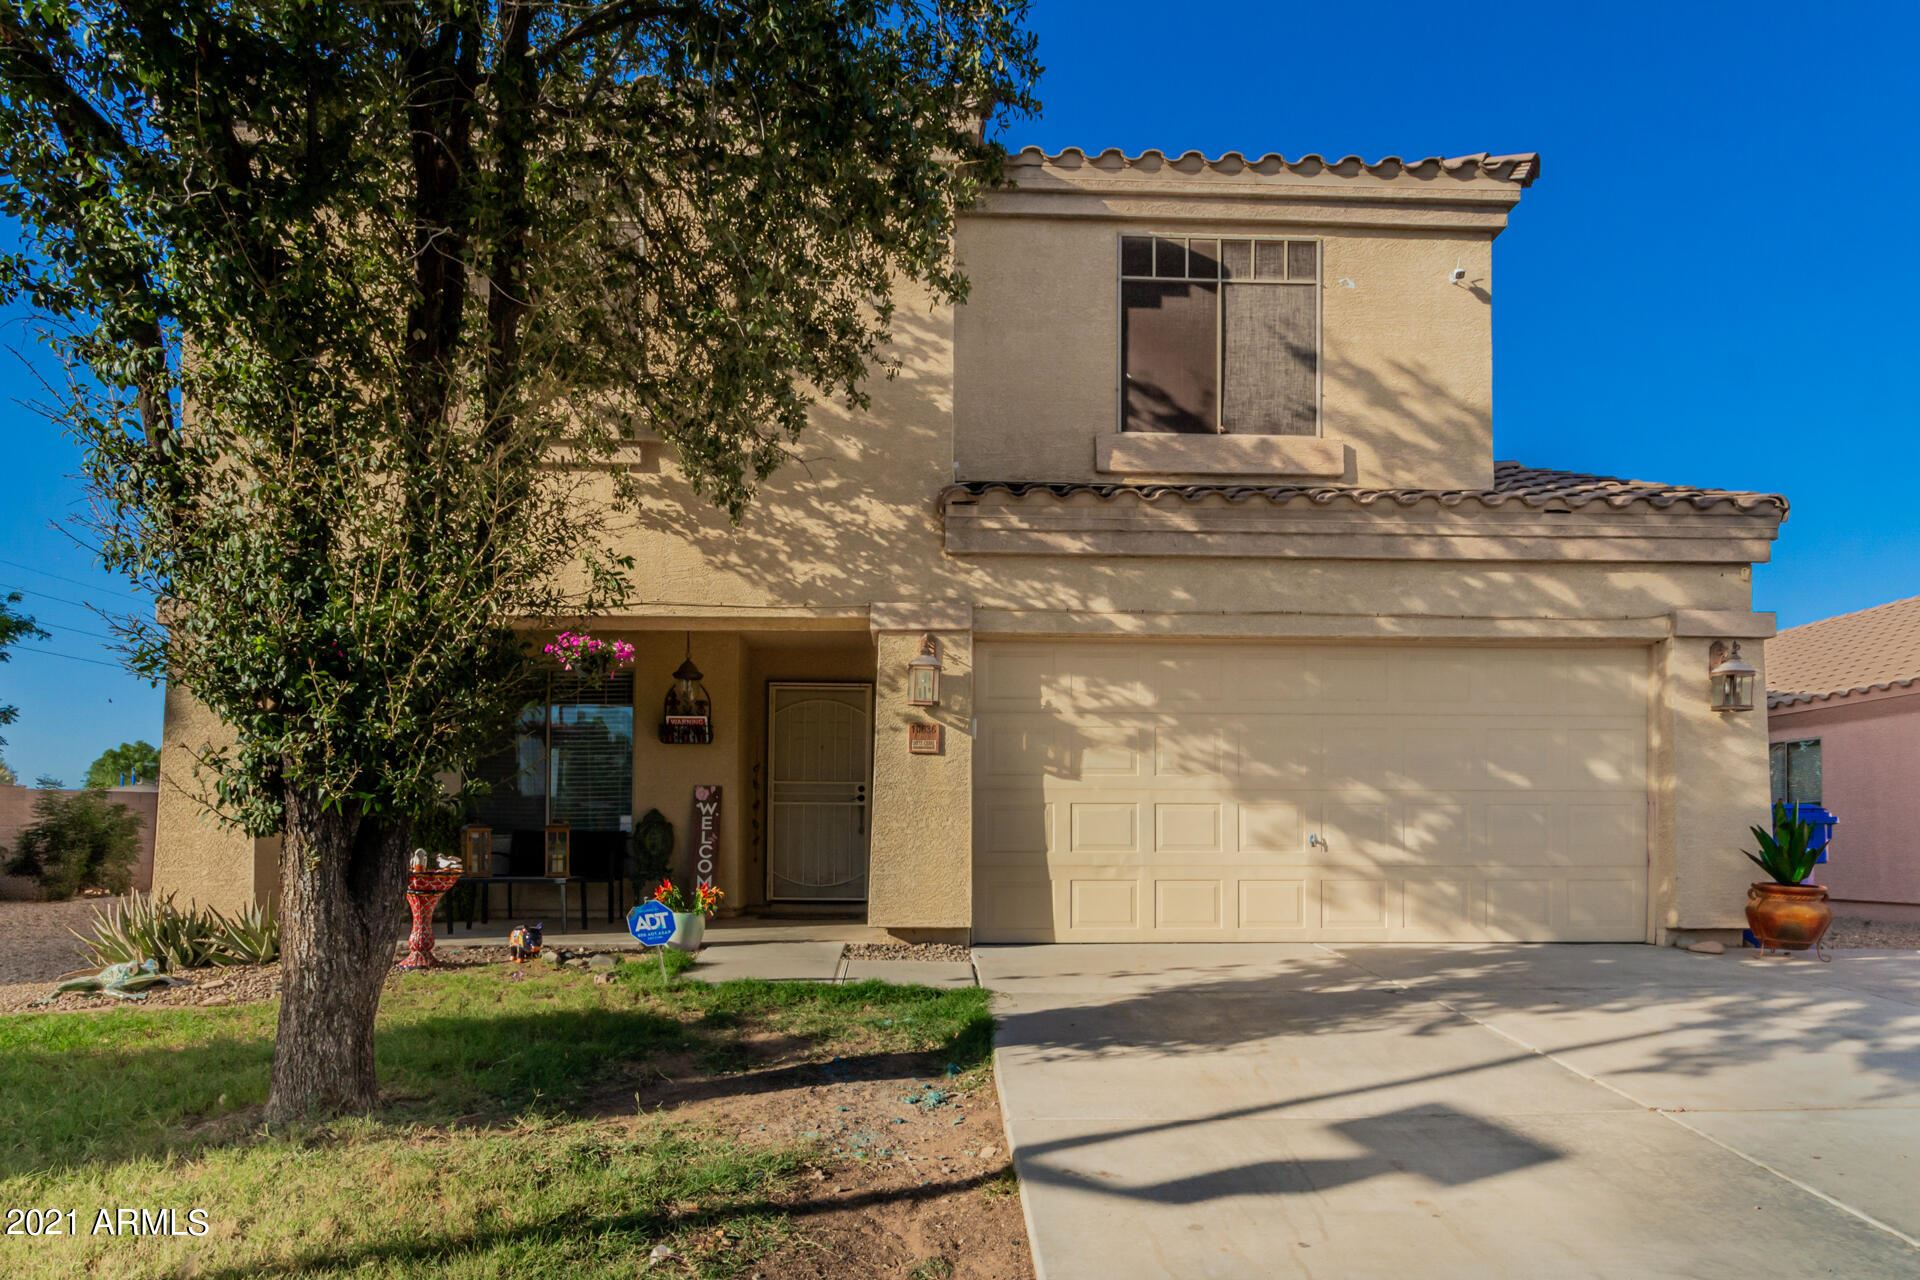 Photo of 10636 W SONORA Street, Tolleson, AZ 85353 (MLS # 6308330)